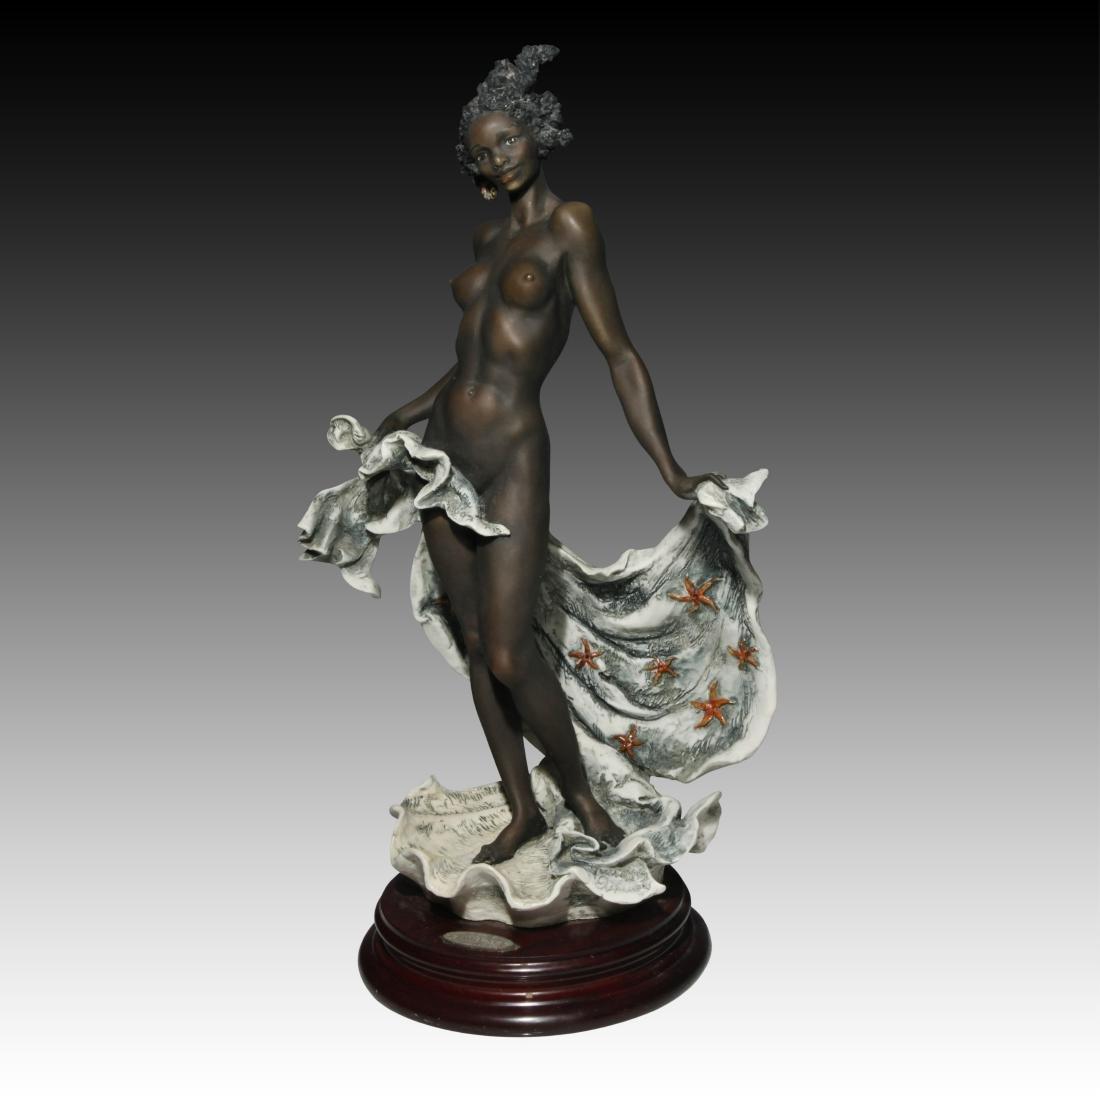 Giuseppe Armani Venere Nera Ebony Woman in Shell